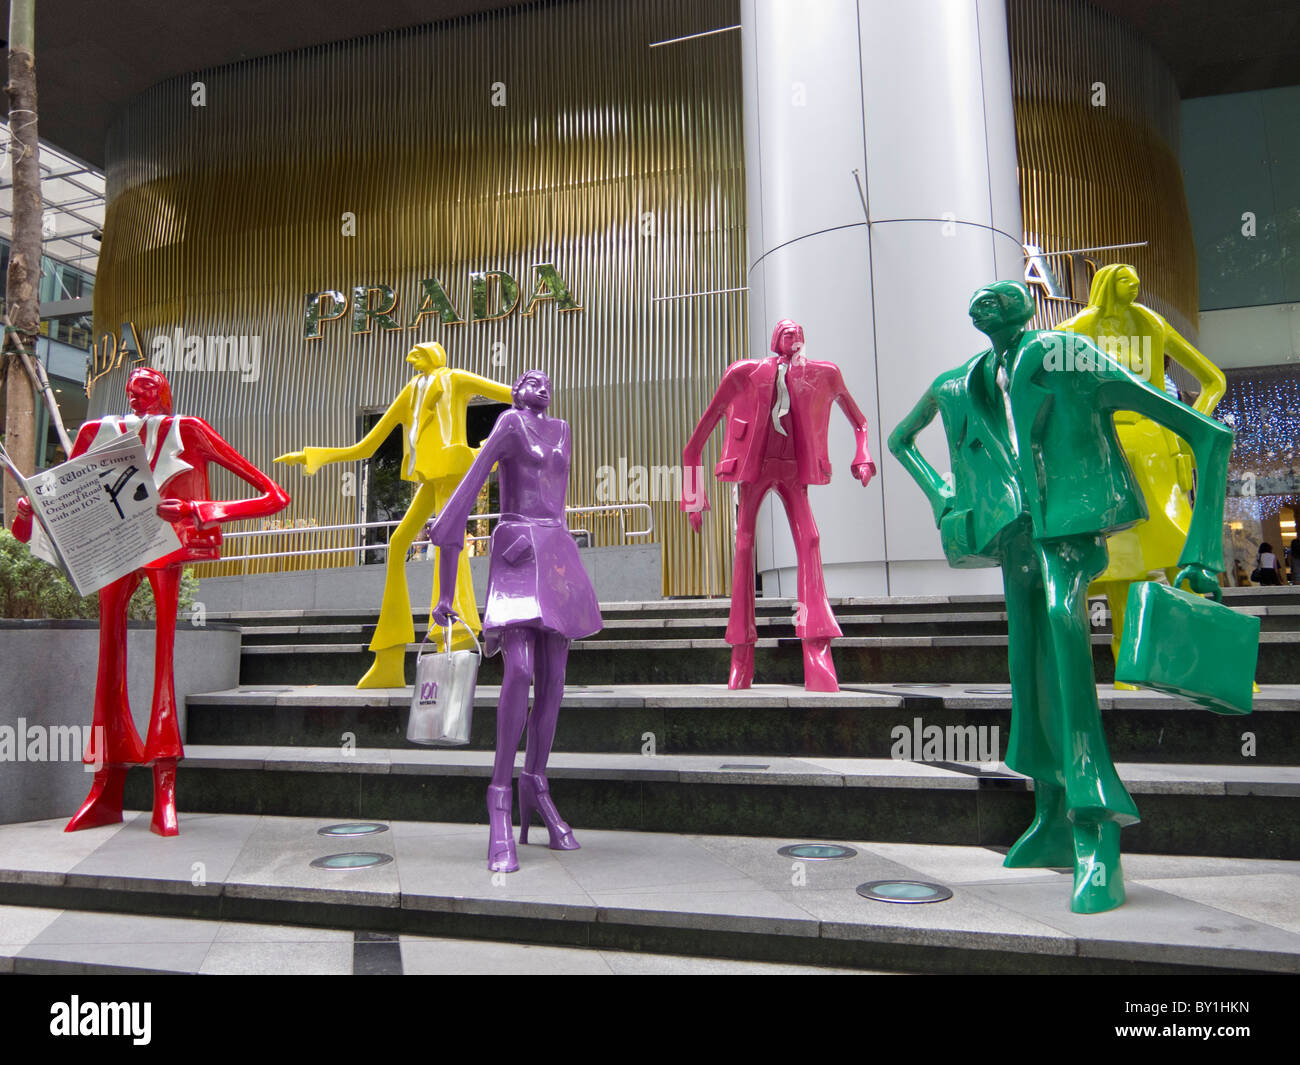 Farbenfrohe moderne Kunst Skulpturen außerhalb Shopping Mall in der Orchard Road in Singapur Stockbild